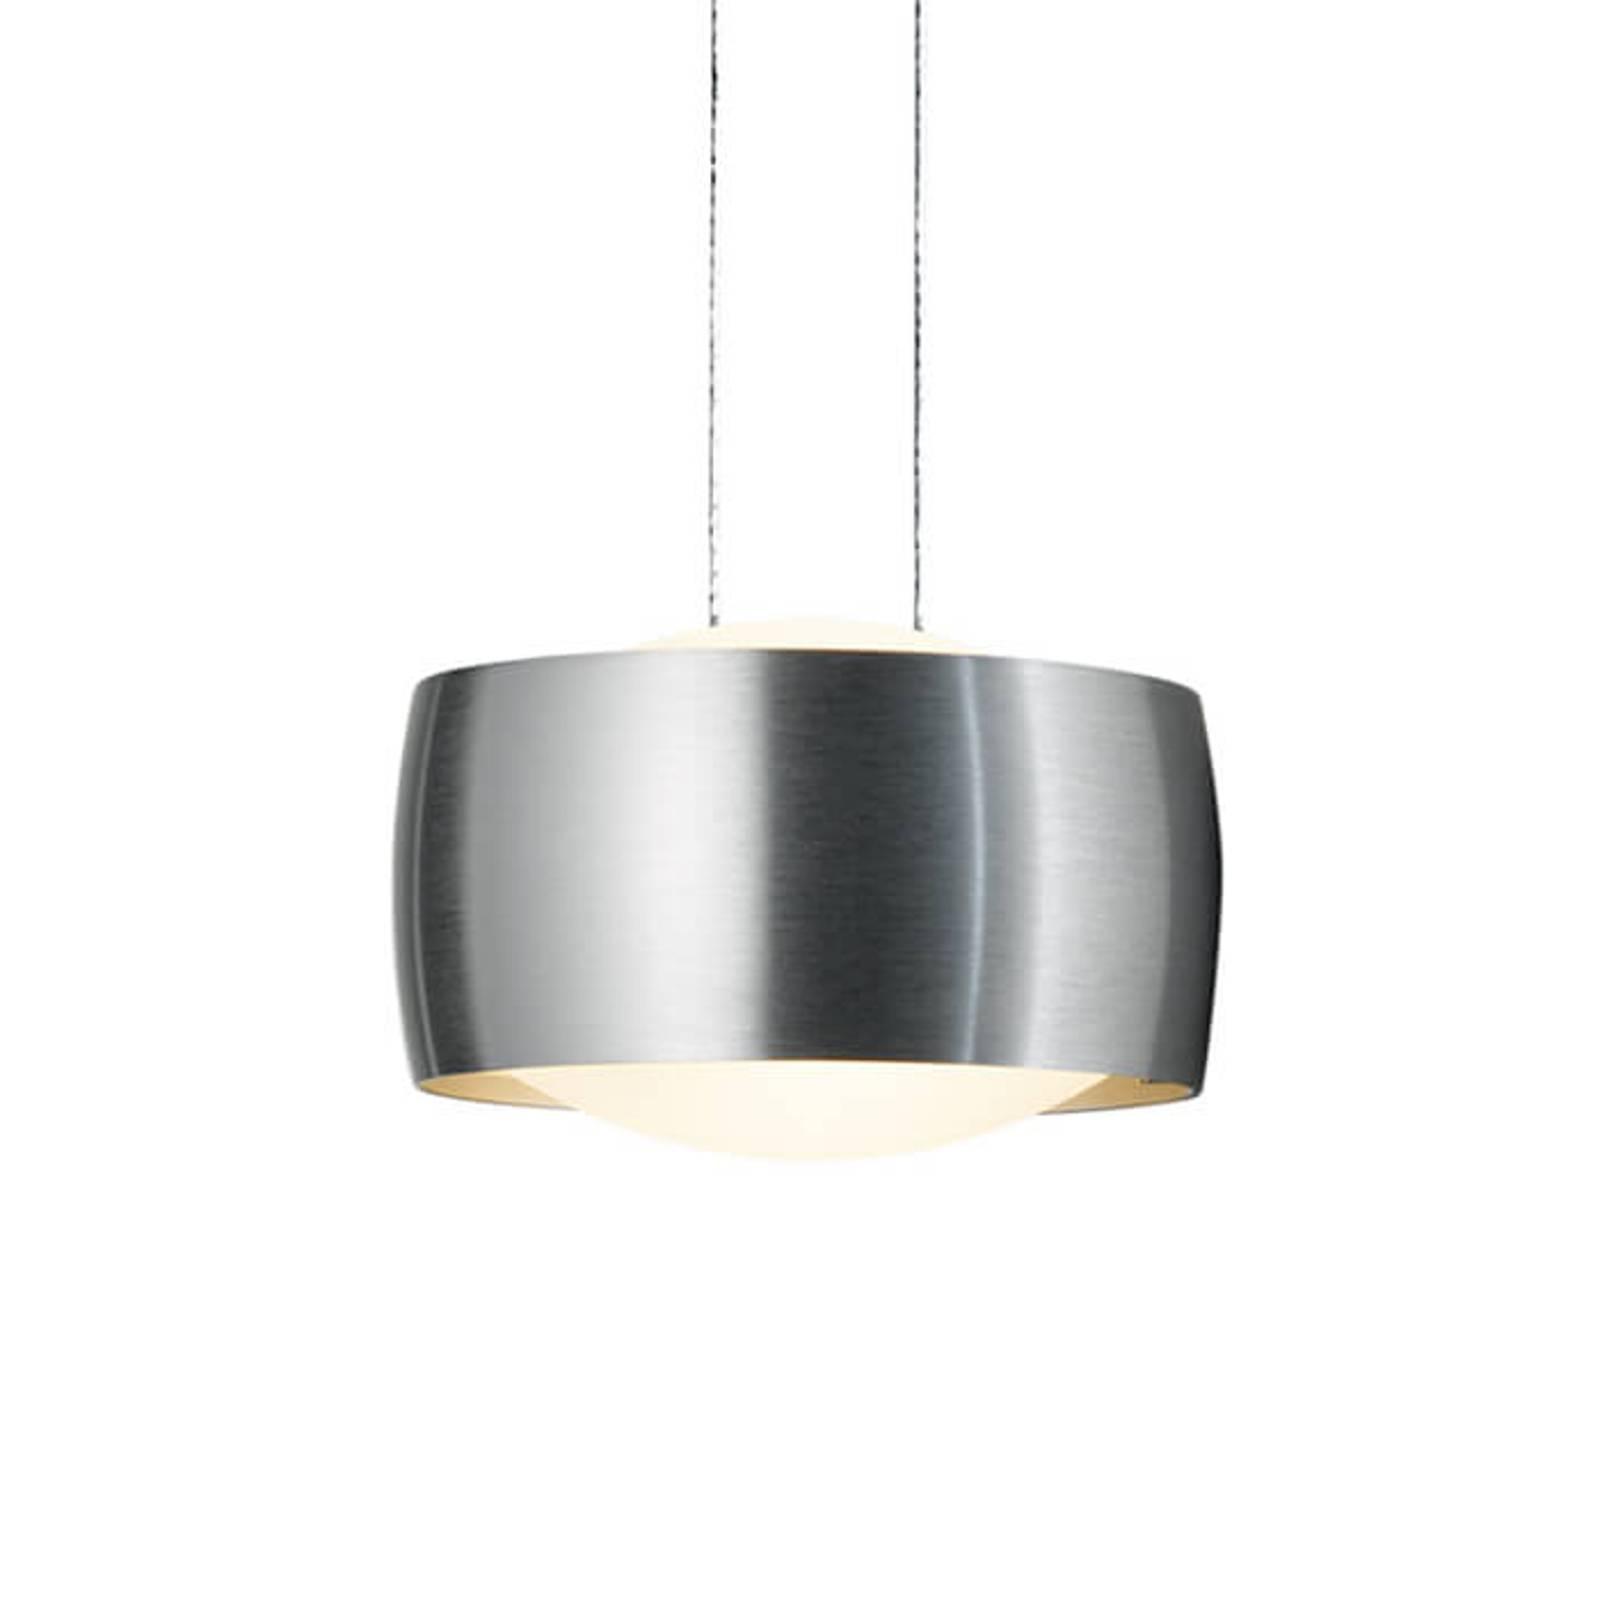 Functionele LED hanglamp Grace